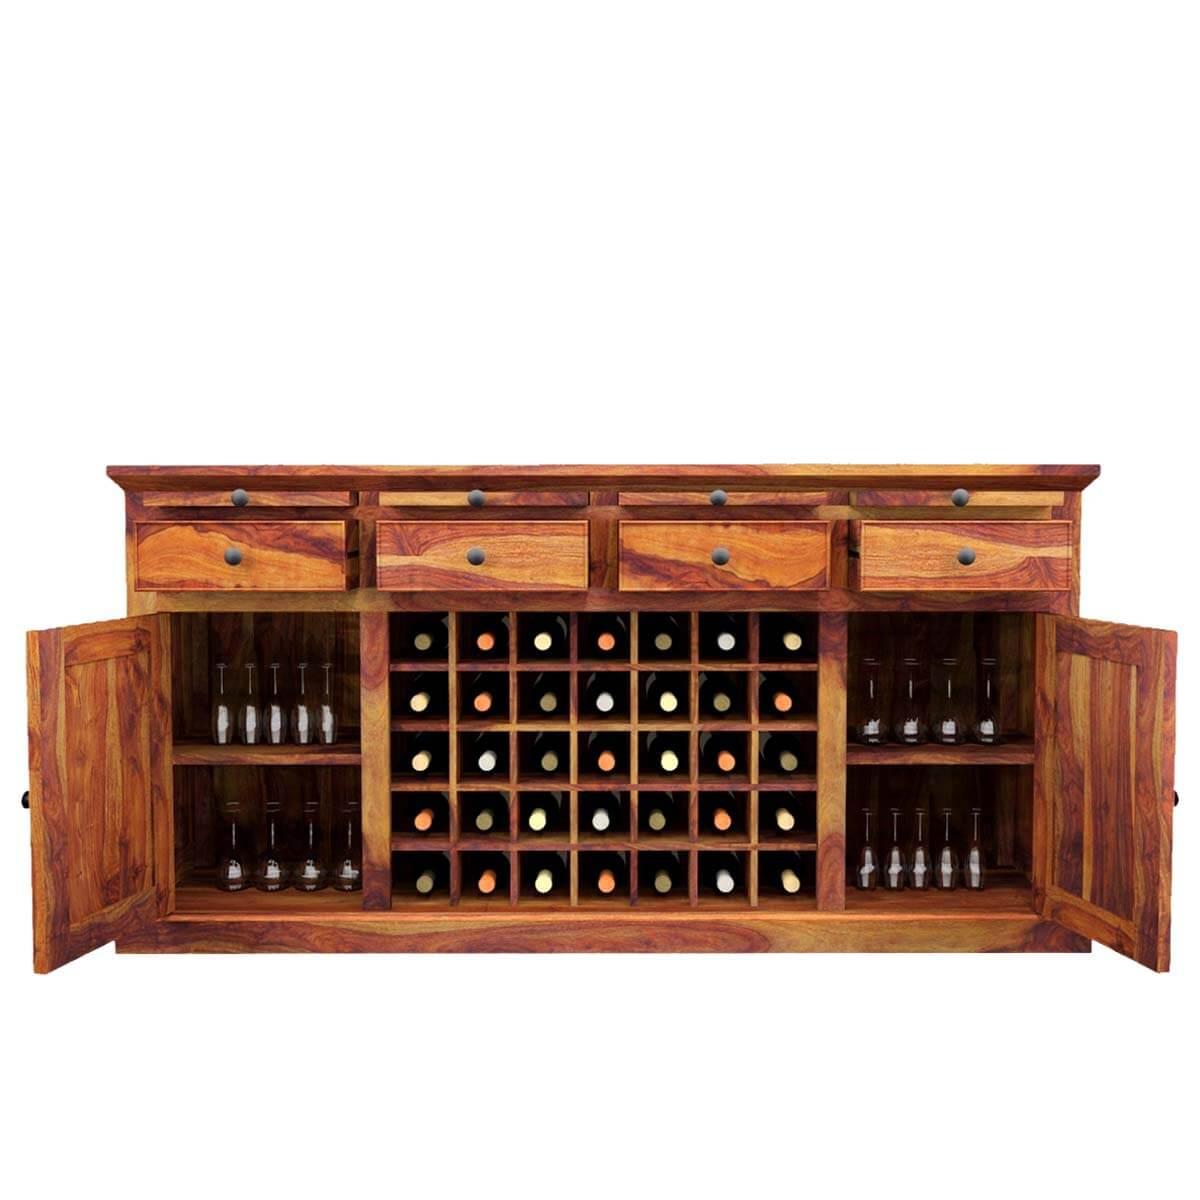 Kitchen Cabinets In Dallas: Oenophile Dallas Ranch Solid Wood Grand Wine Bar Cabinet